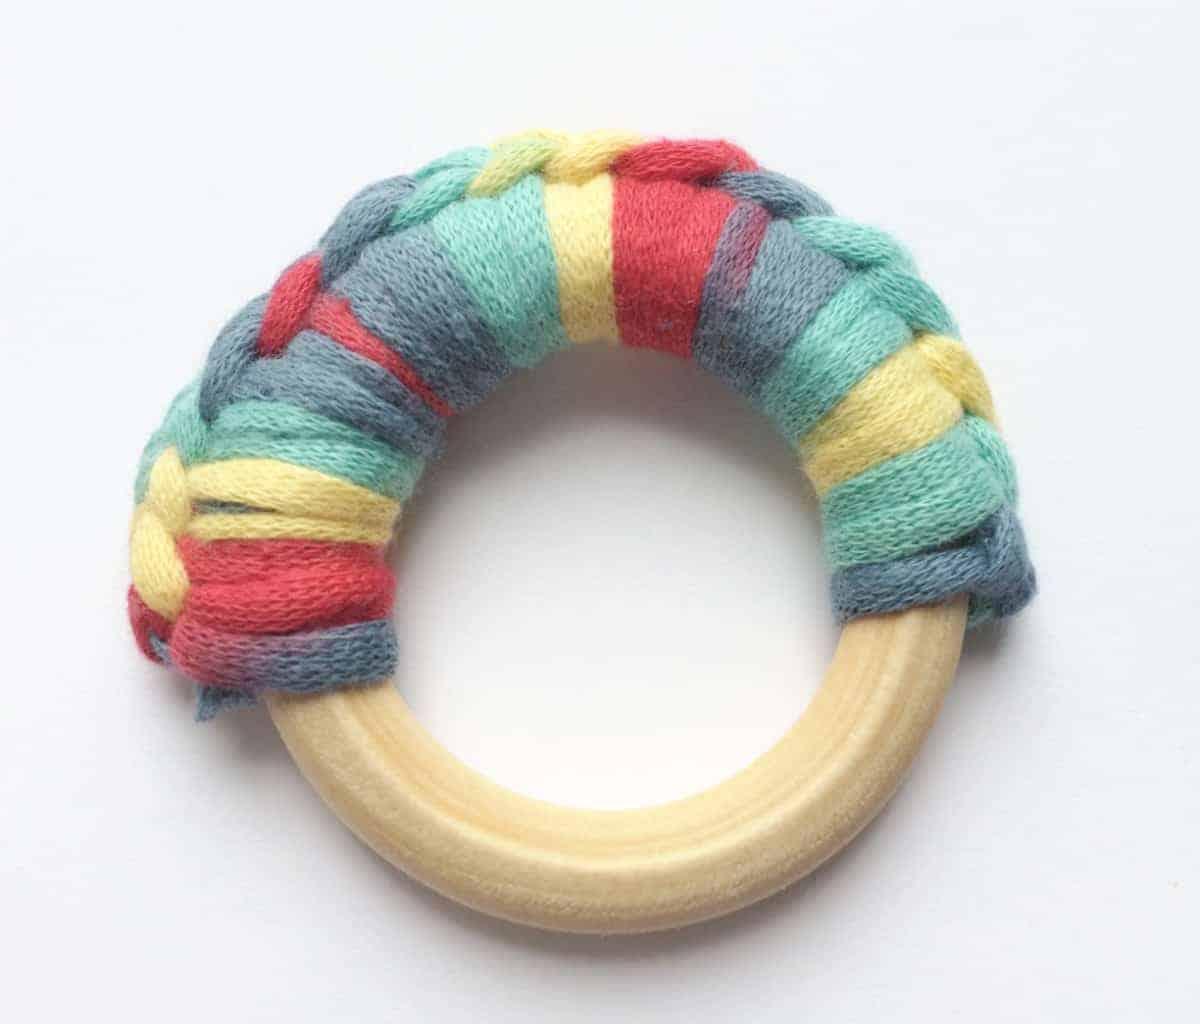 Wooden Ring Teether Crochet Pattern + Tutorial